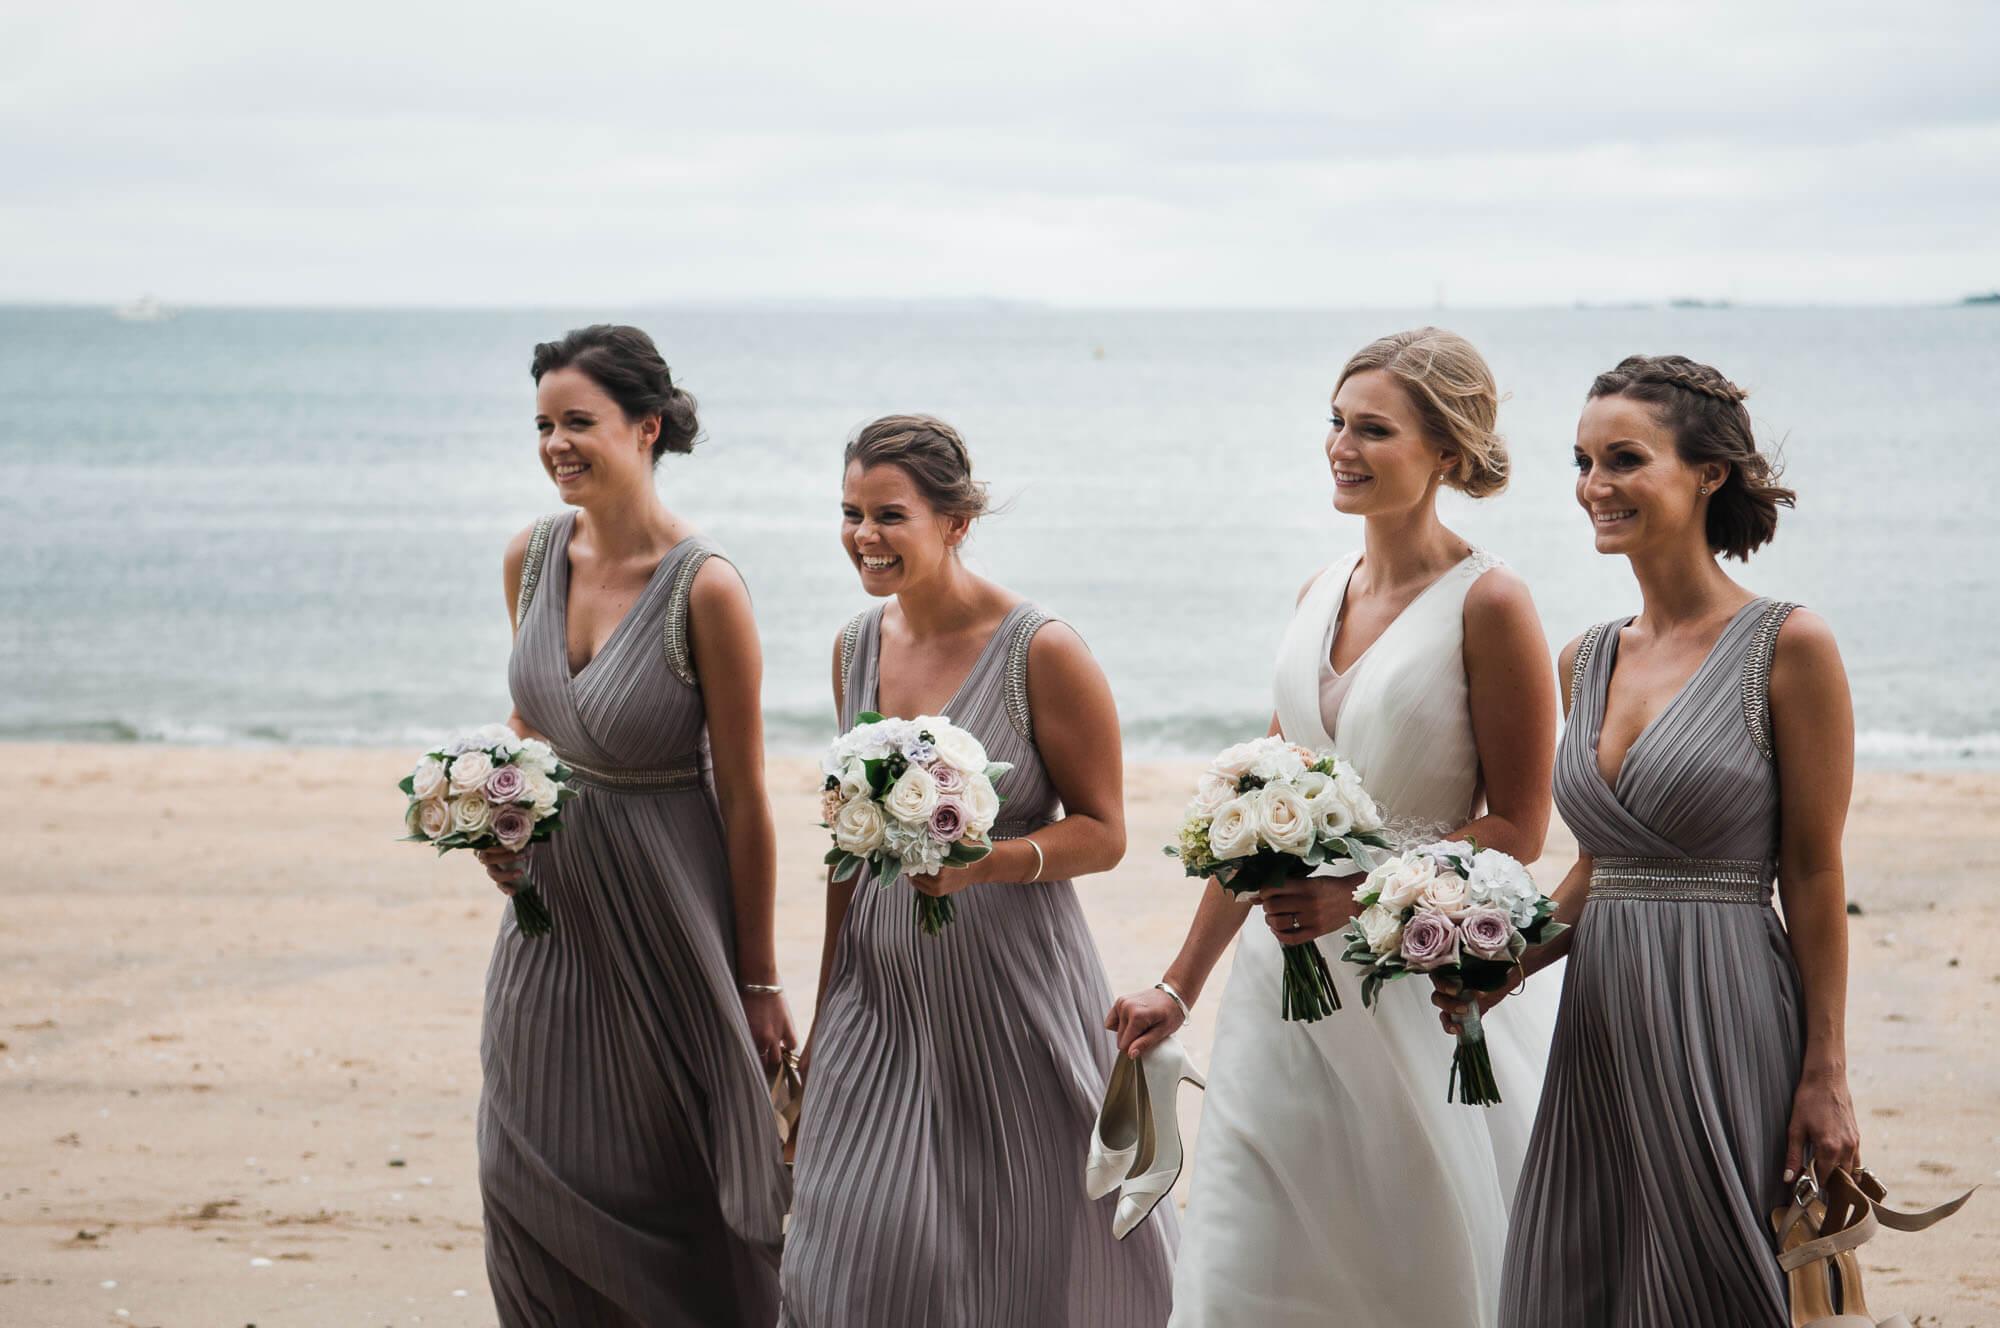 bride-walks-down-beach-with-bridesmaids.jpg